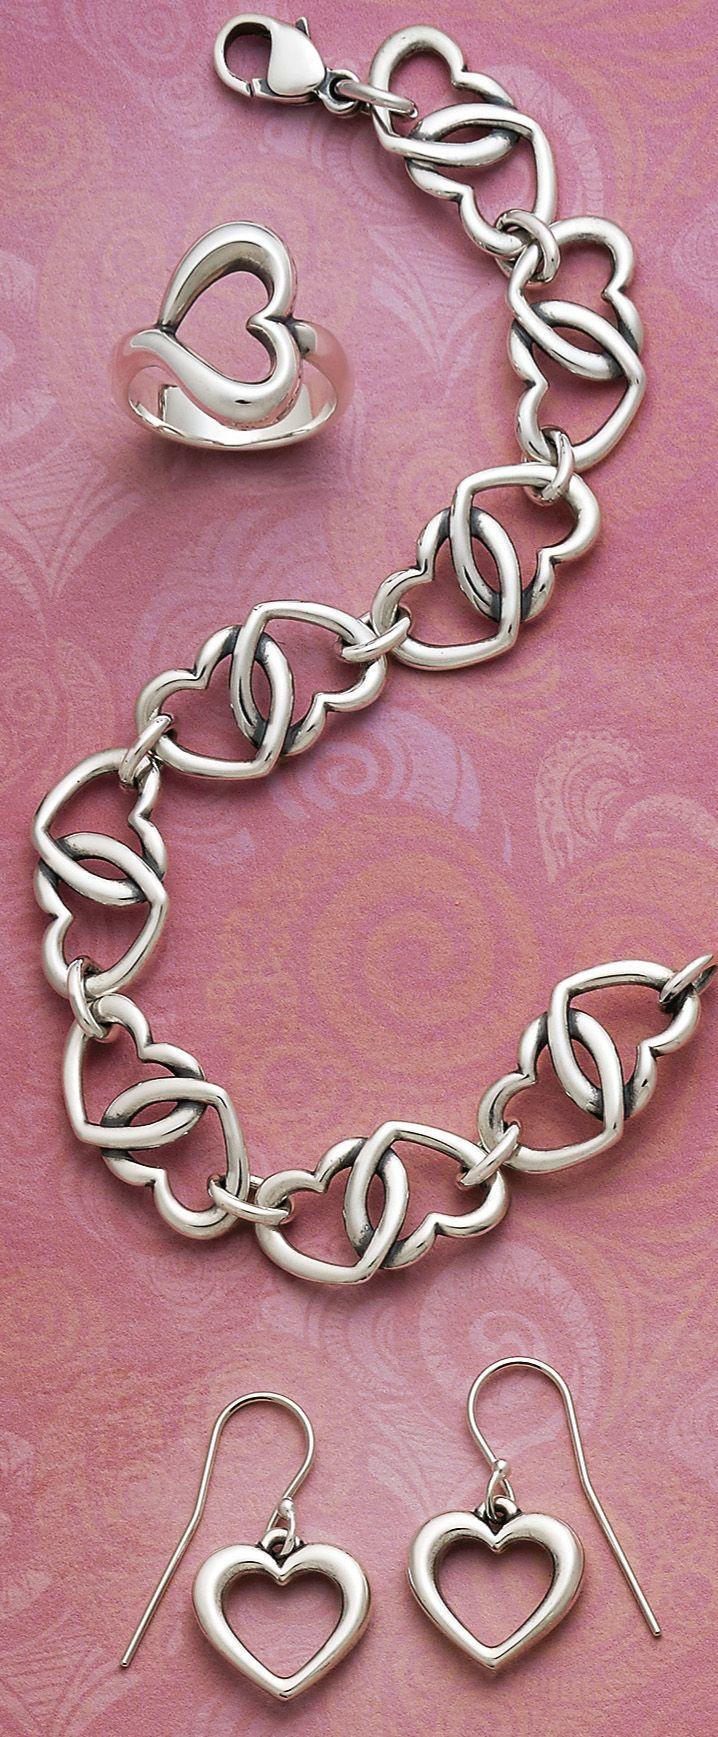 116 best Pretty jewelry images on Pinterest | Bangle bracelets ...